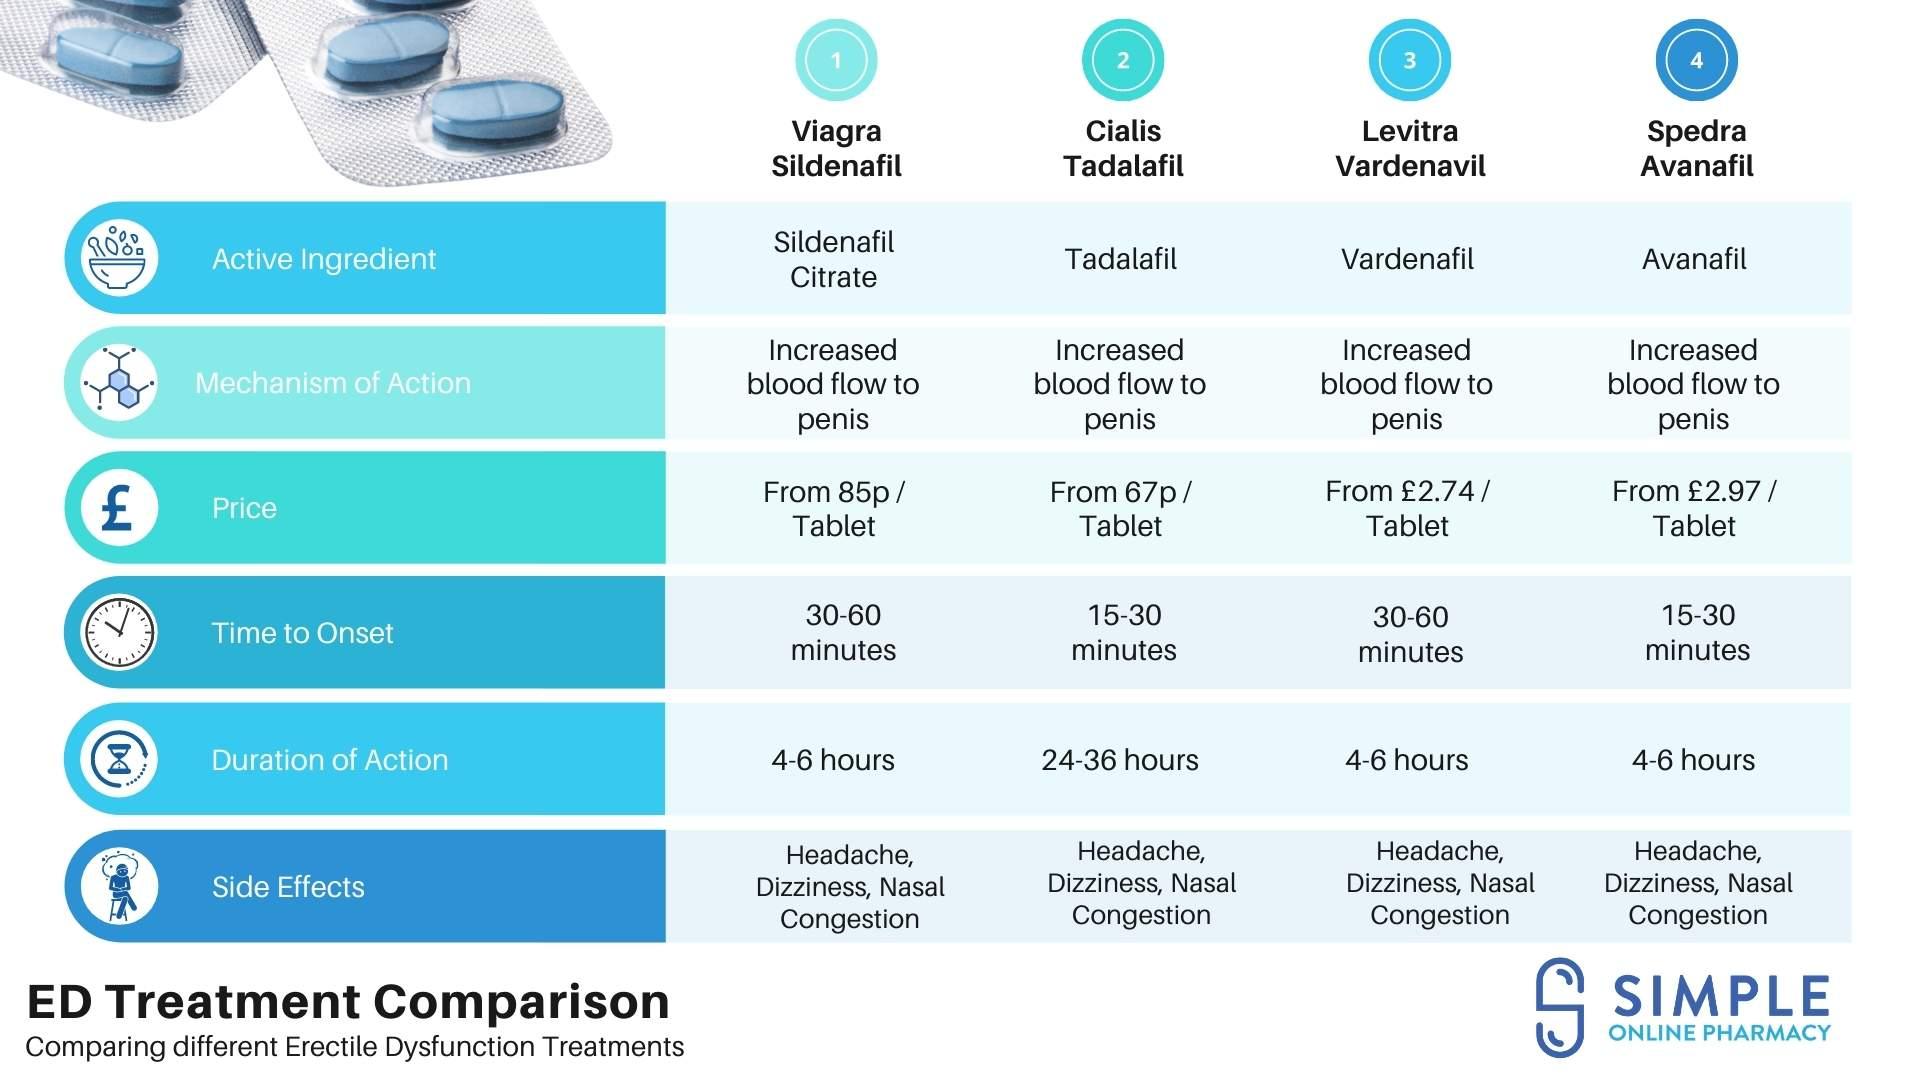 ED Treatment Comparison